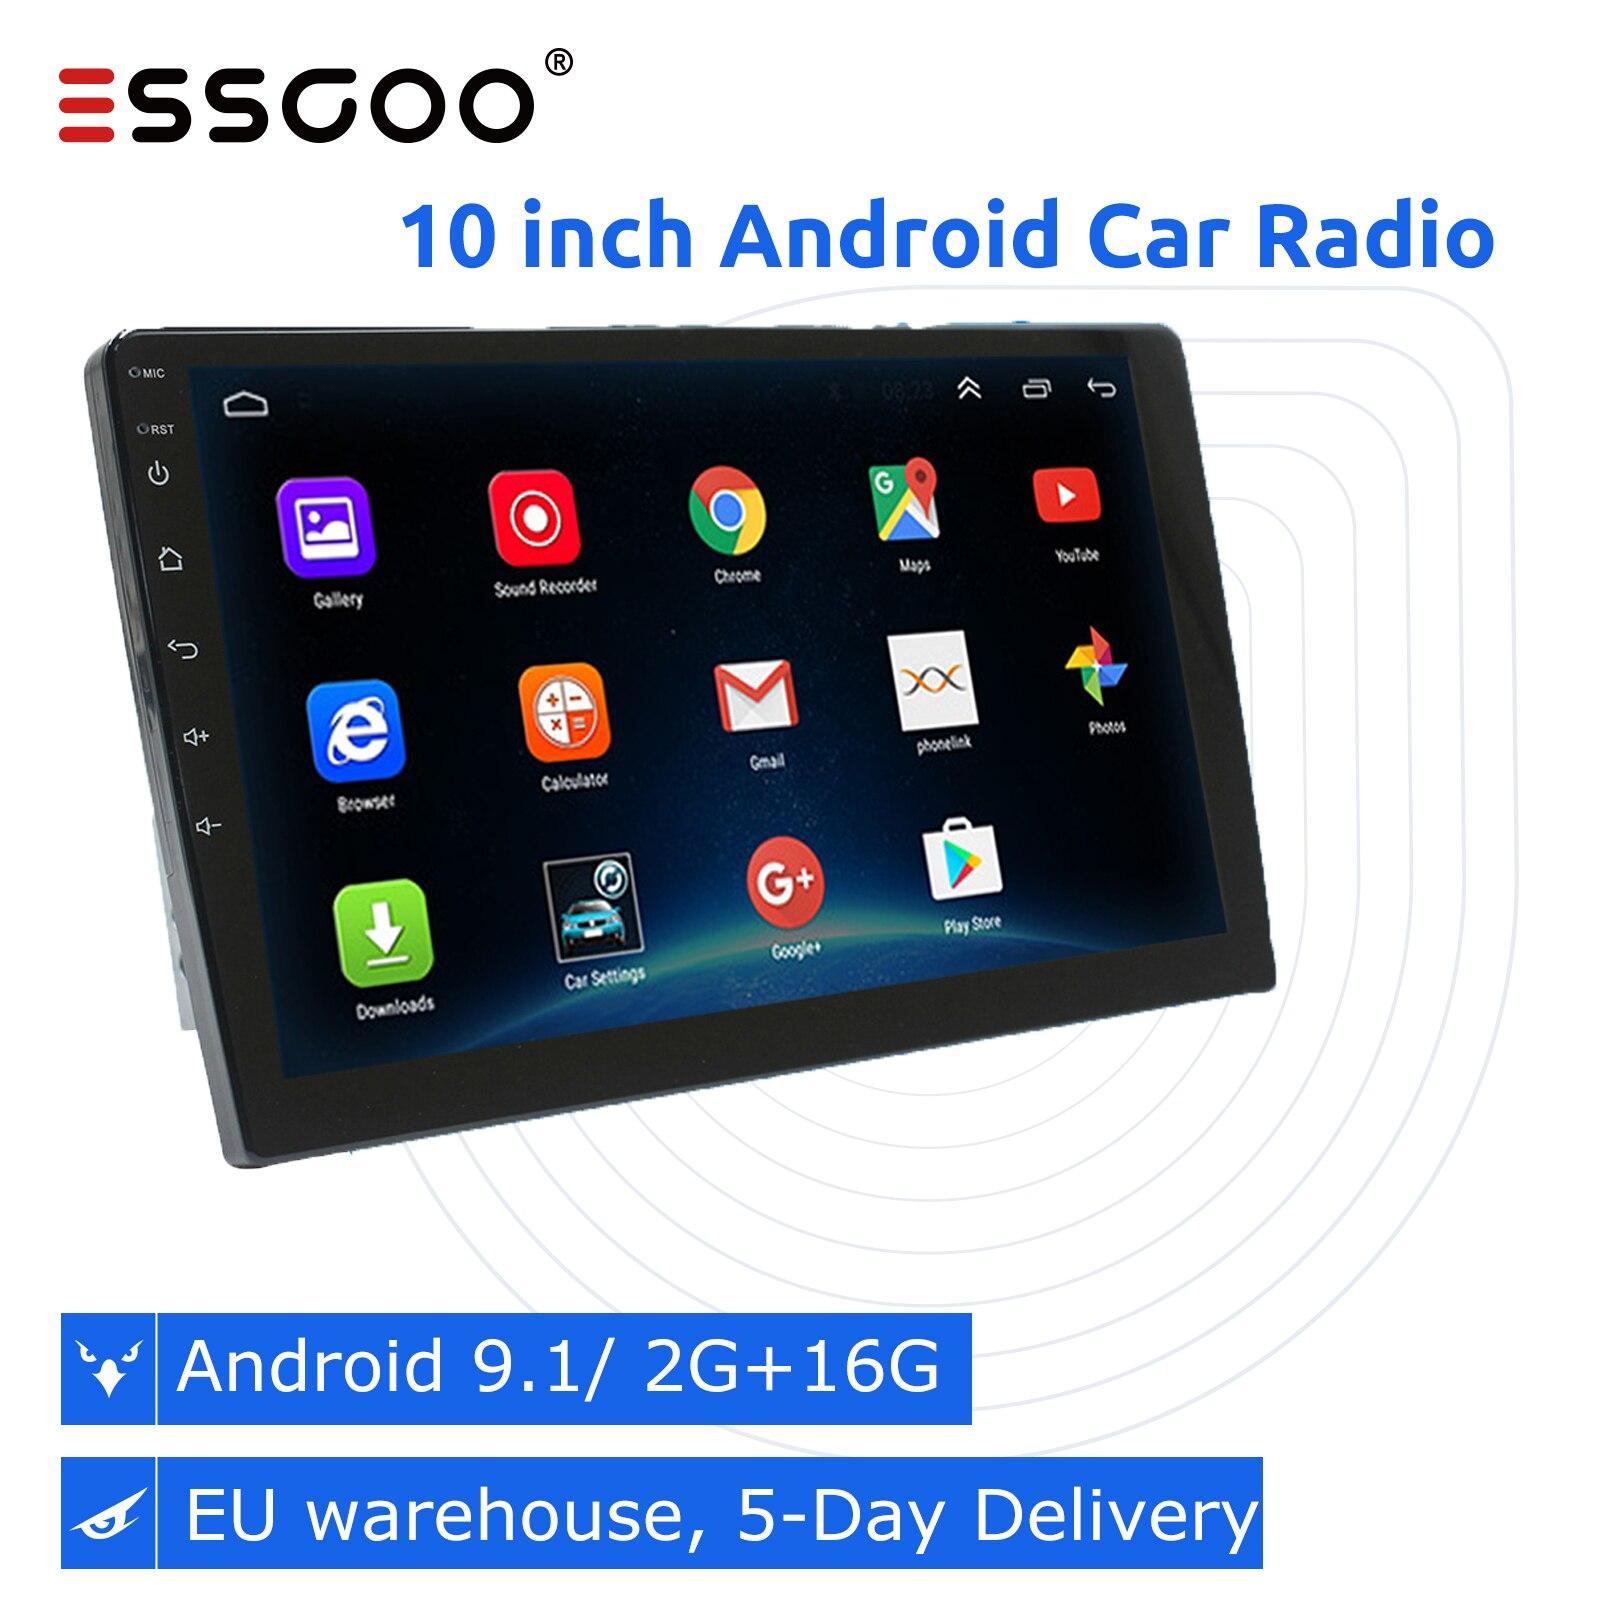 Essgoo-راديو السيارة 10.1 بوصة ، Android 2 16 جيجابايت ، نظام تحديد المواقع العالمي (GPS) ، WIFI ، Bluetooth ، mirrorlink ، مشغل الوسائط